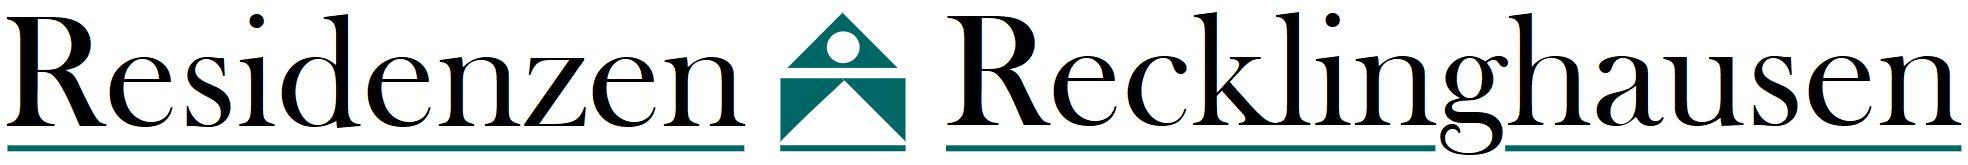 Residenzen Recklinghausen Logo